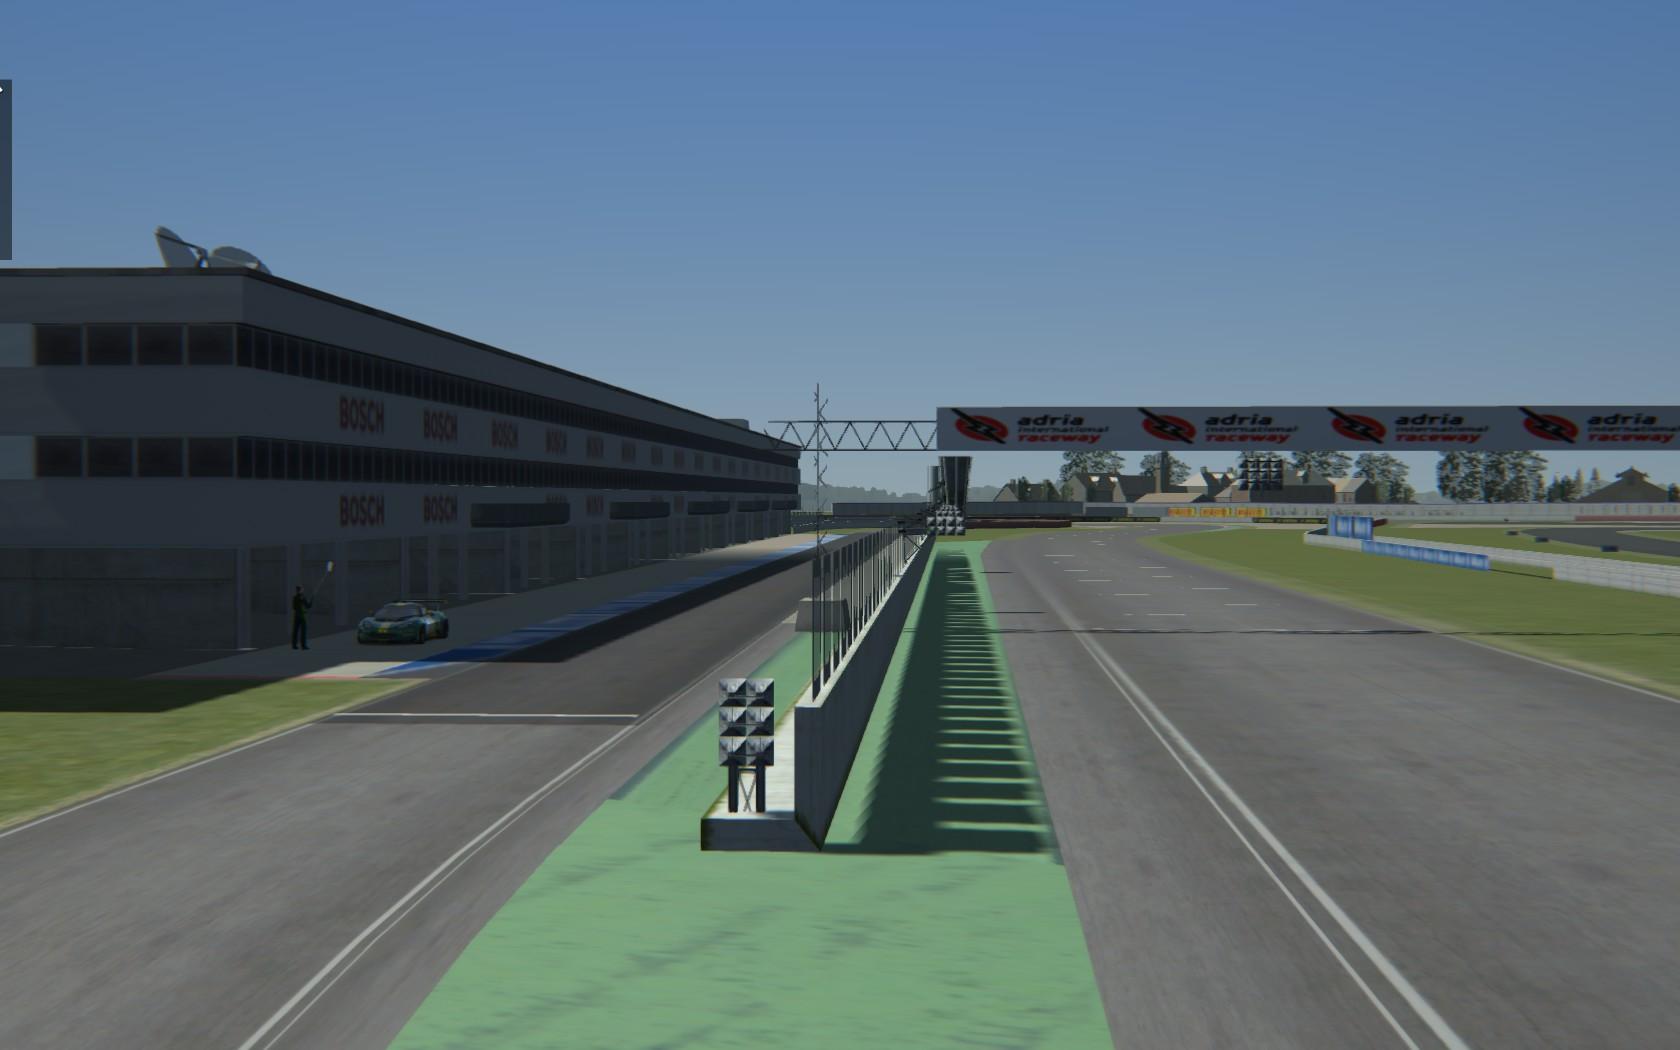 Circuito Adria : Adria int raceway adriaraceway twitter